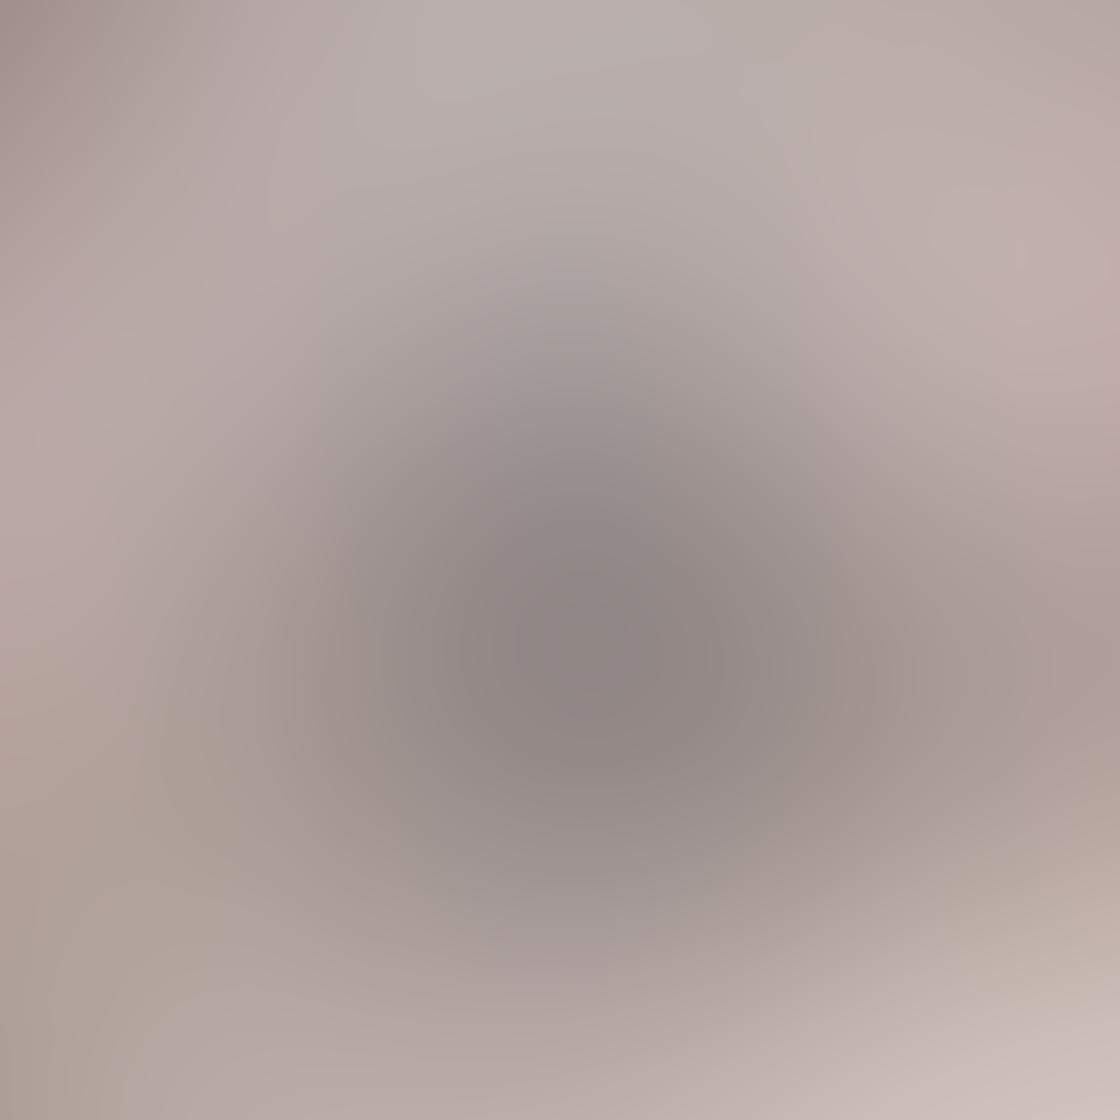 iPhone Photos Low Angle 17